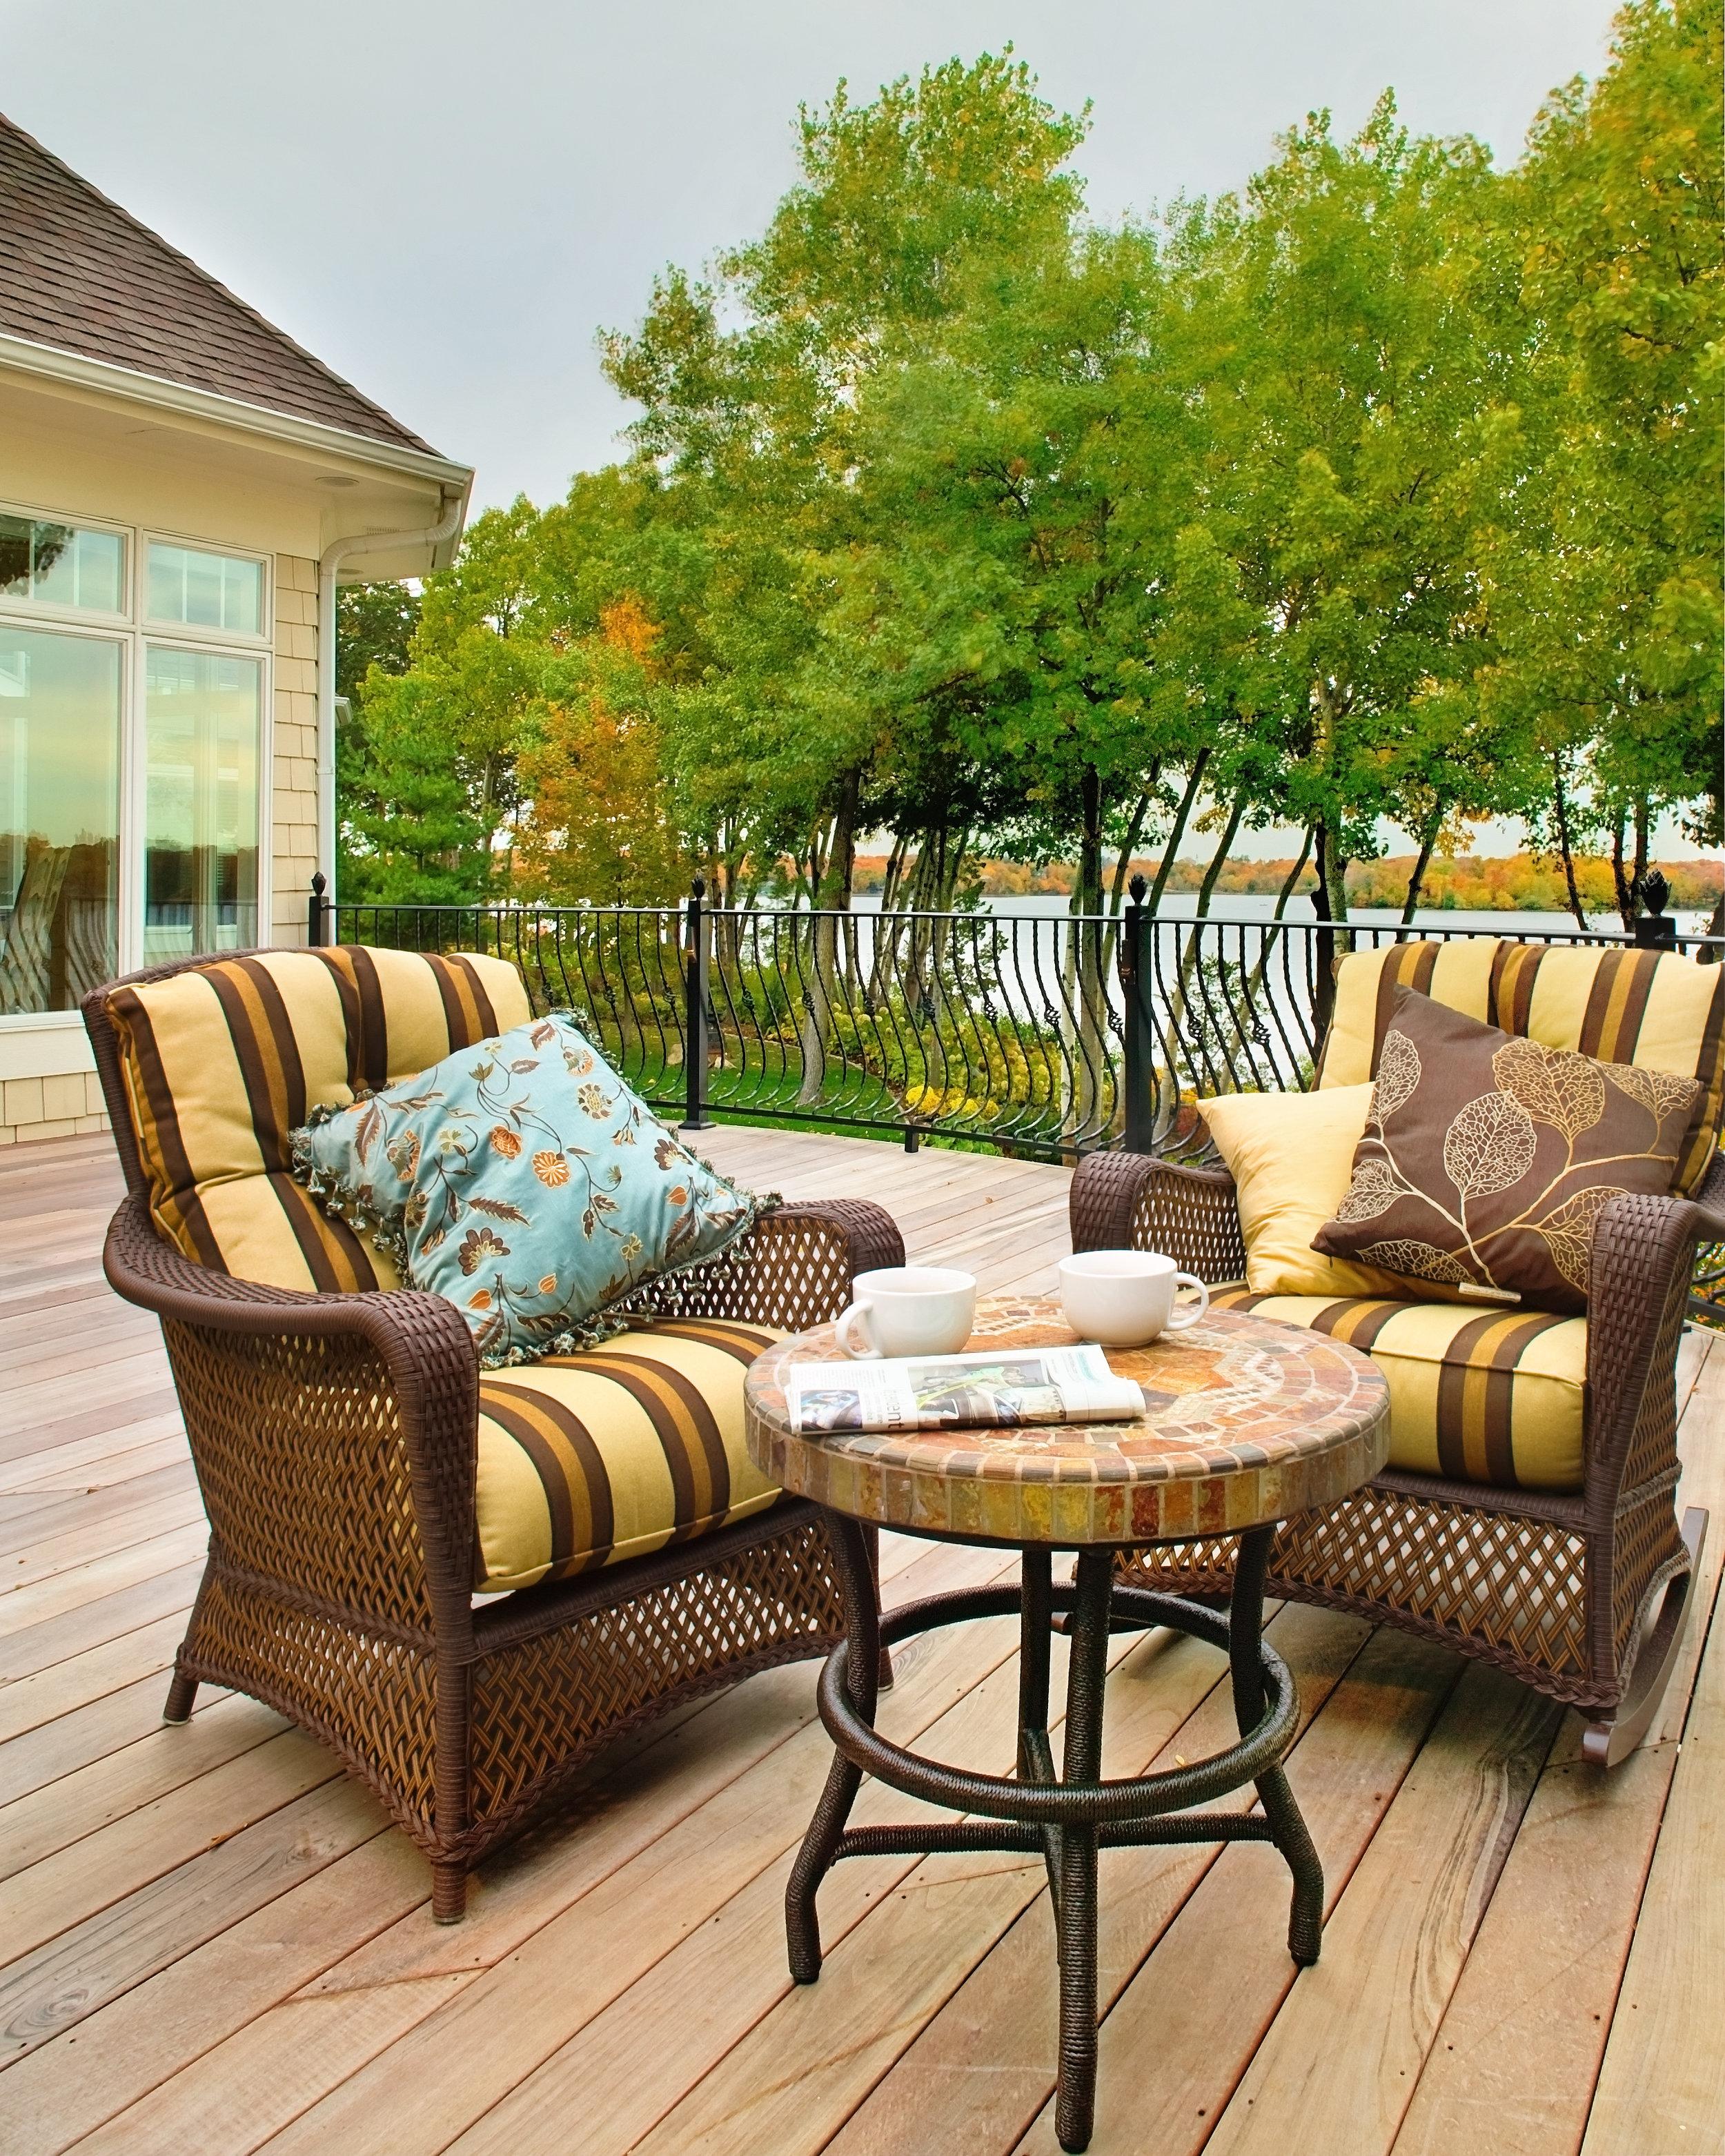 Moms Design Build - Hardwood Deck Lake Minnetonka